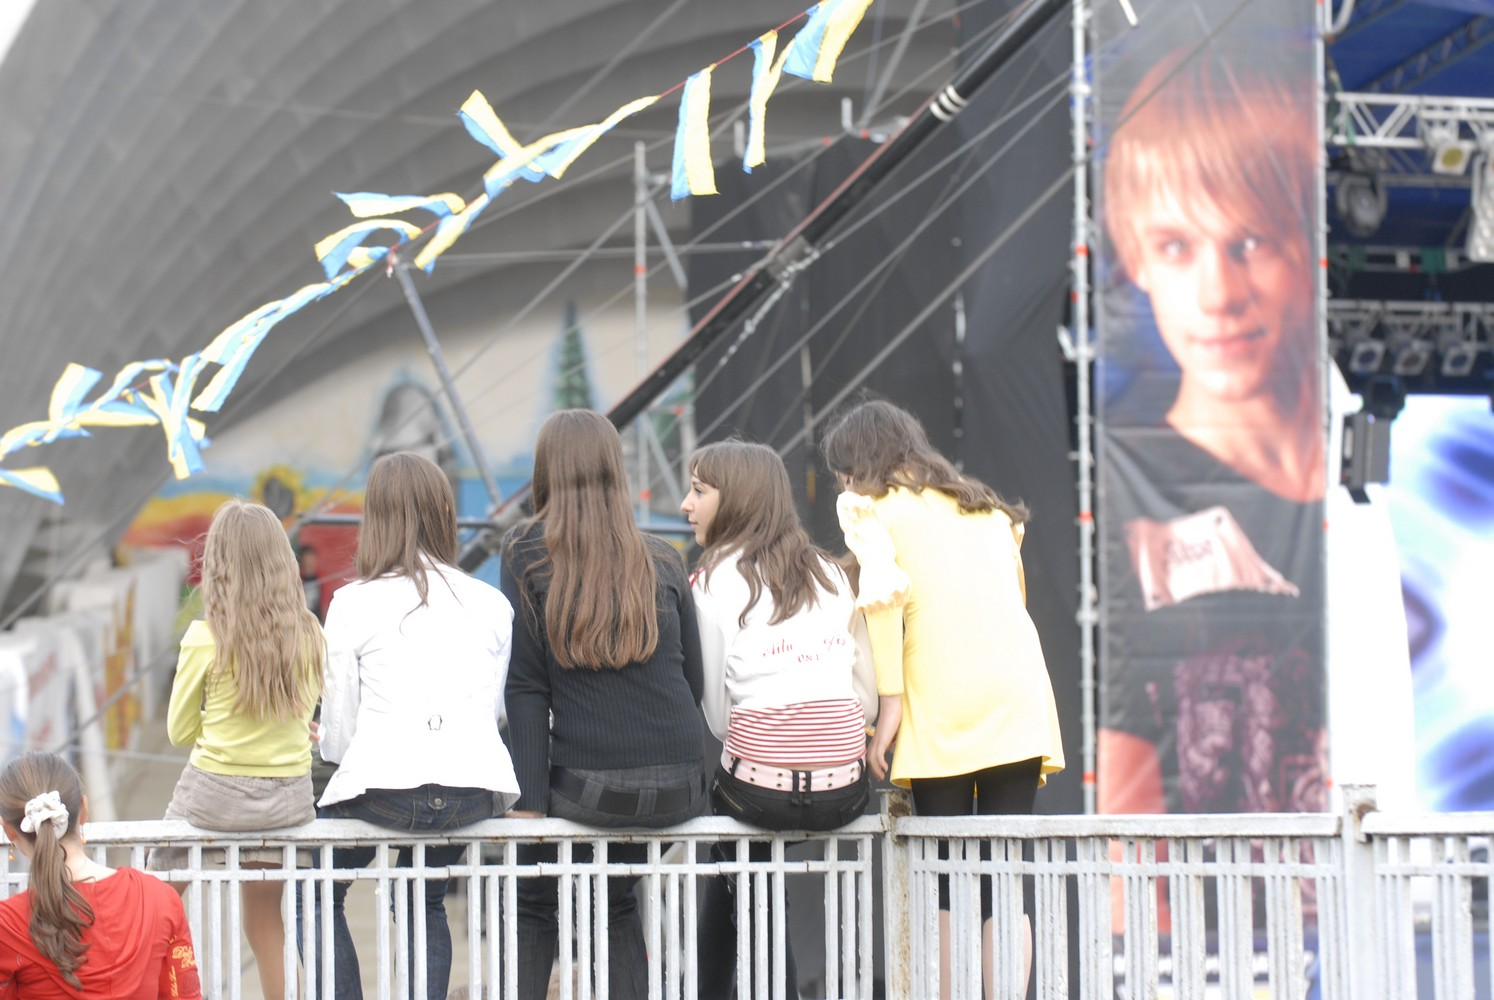 eduard-romanyuta-grand-show-2008_1